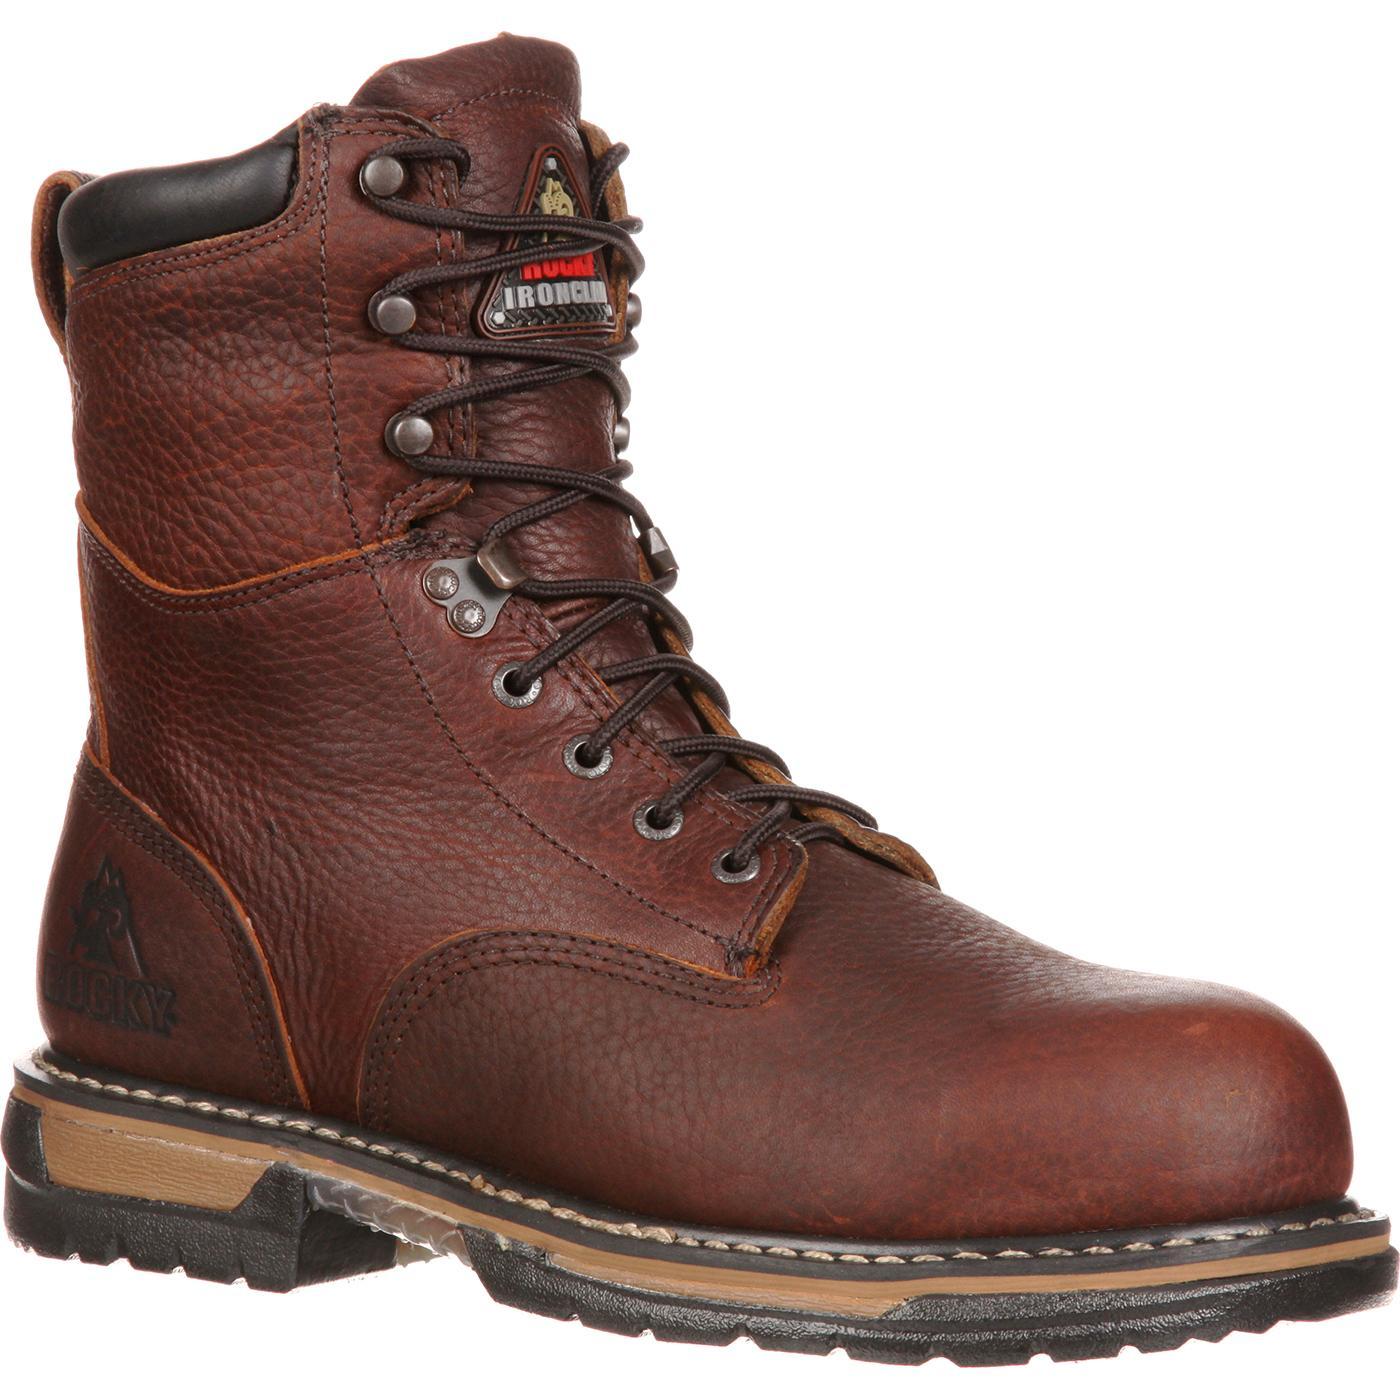 2c2be849911 Rocky IronClad Steel Toe Waterproof Work Boot